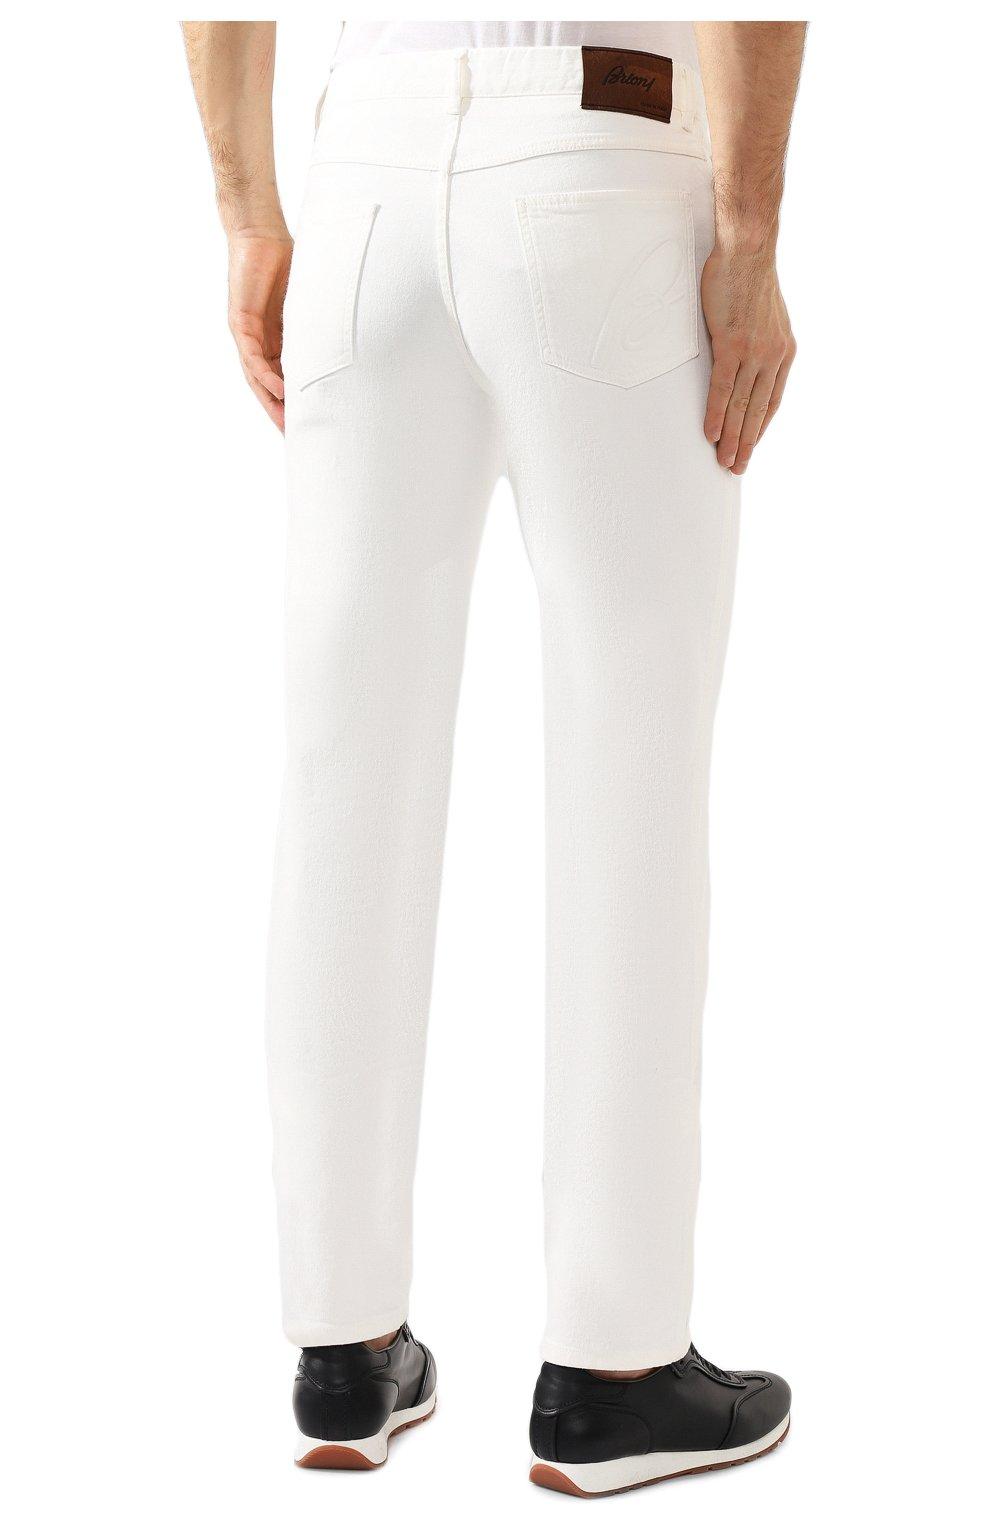 Мужские джинсы BRIONI белого цвета, арт. SPNJ0M/08T01/STELVI0 | Фото 4